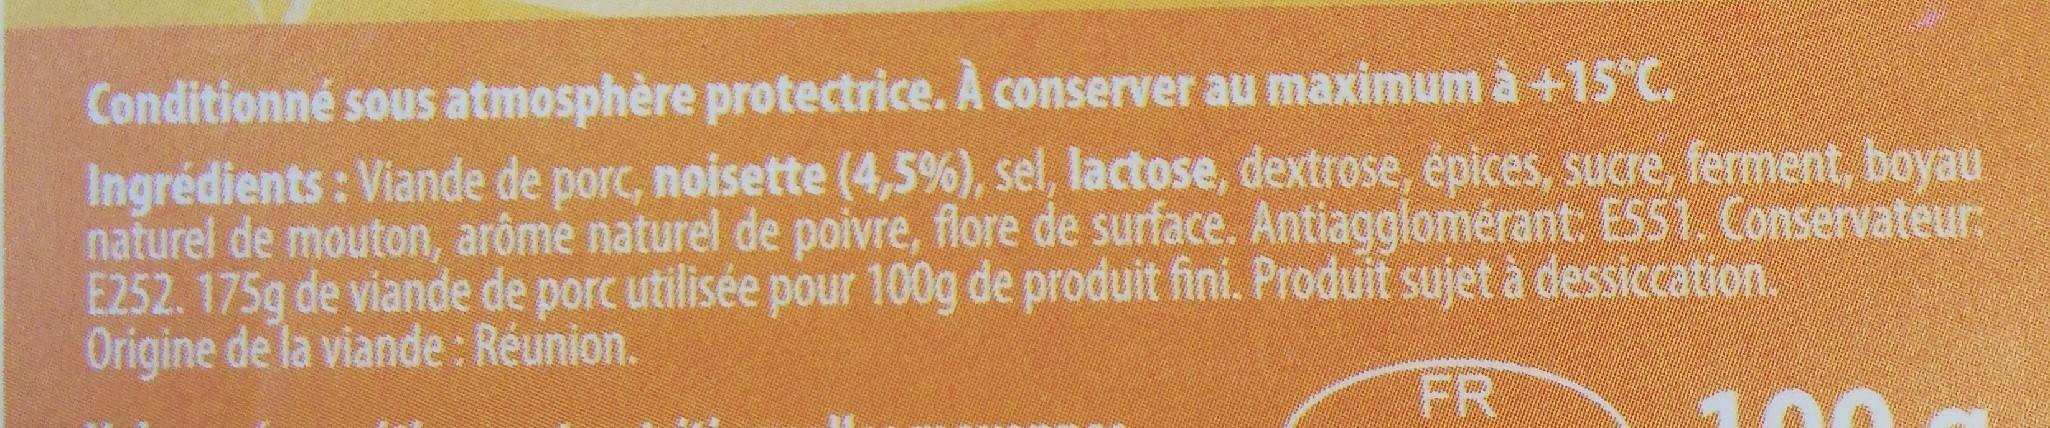 Aperi Crock Noisette - Ingrediënten - fr